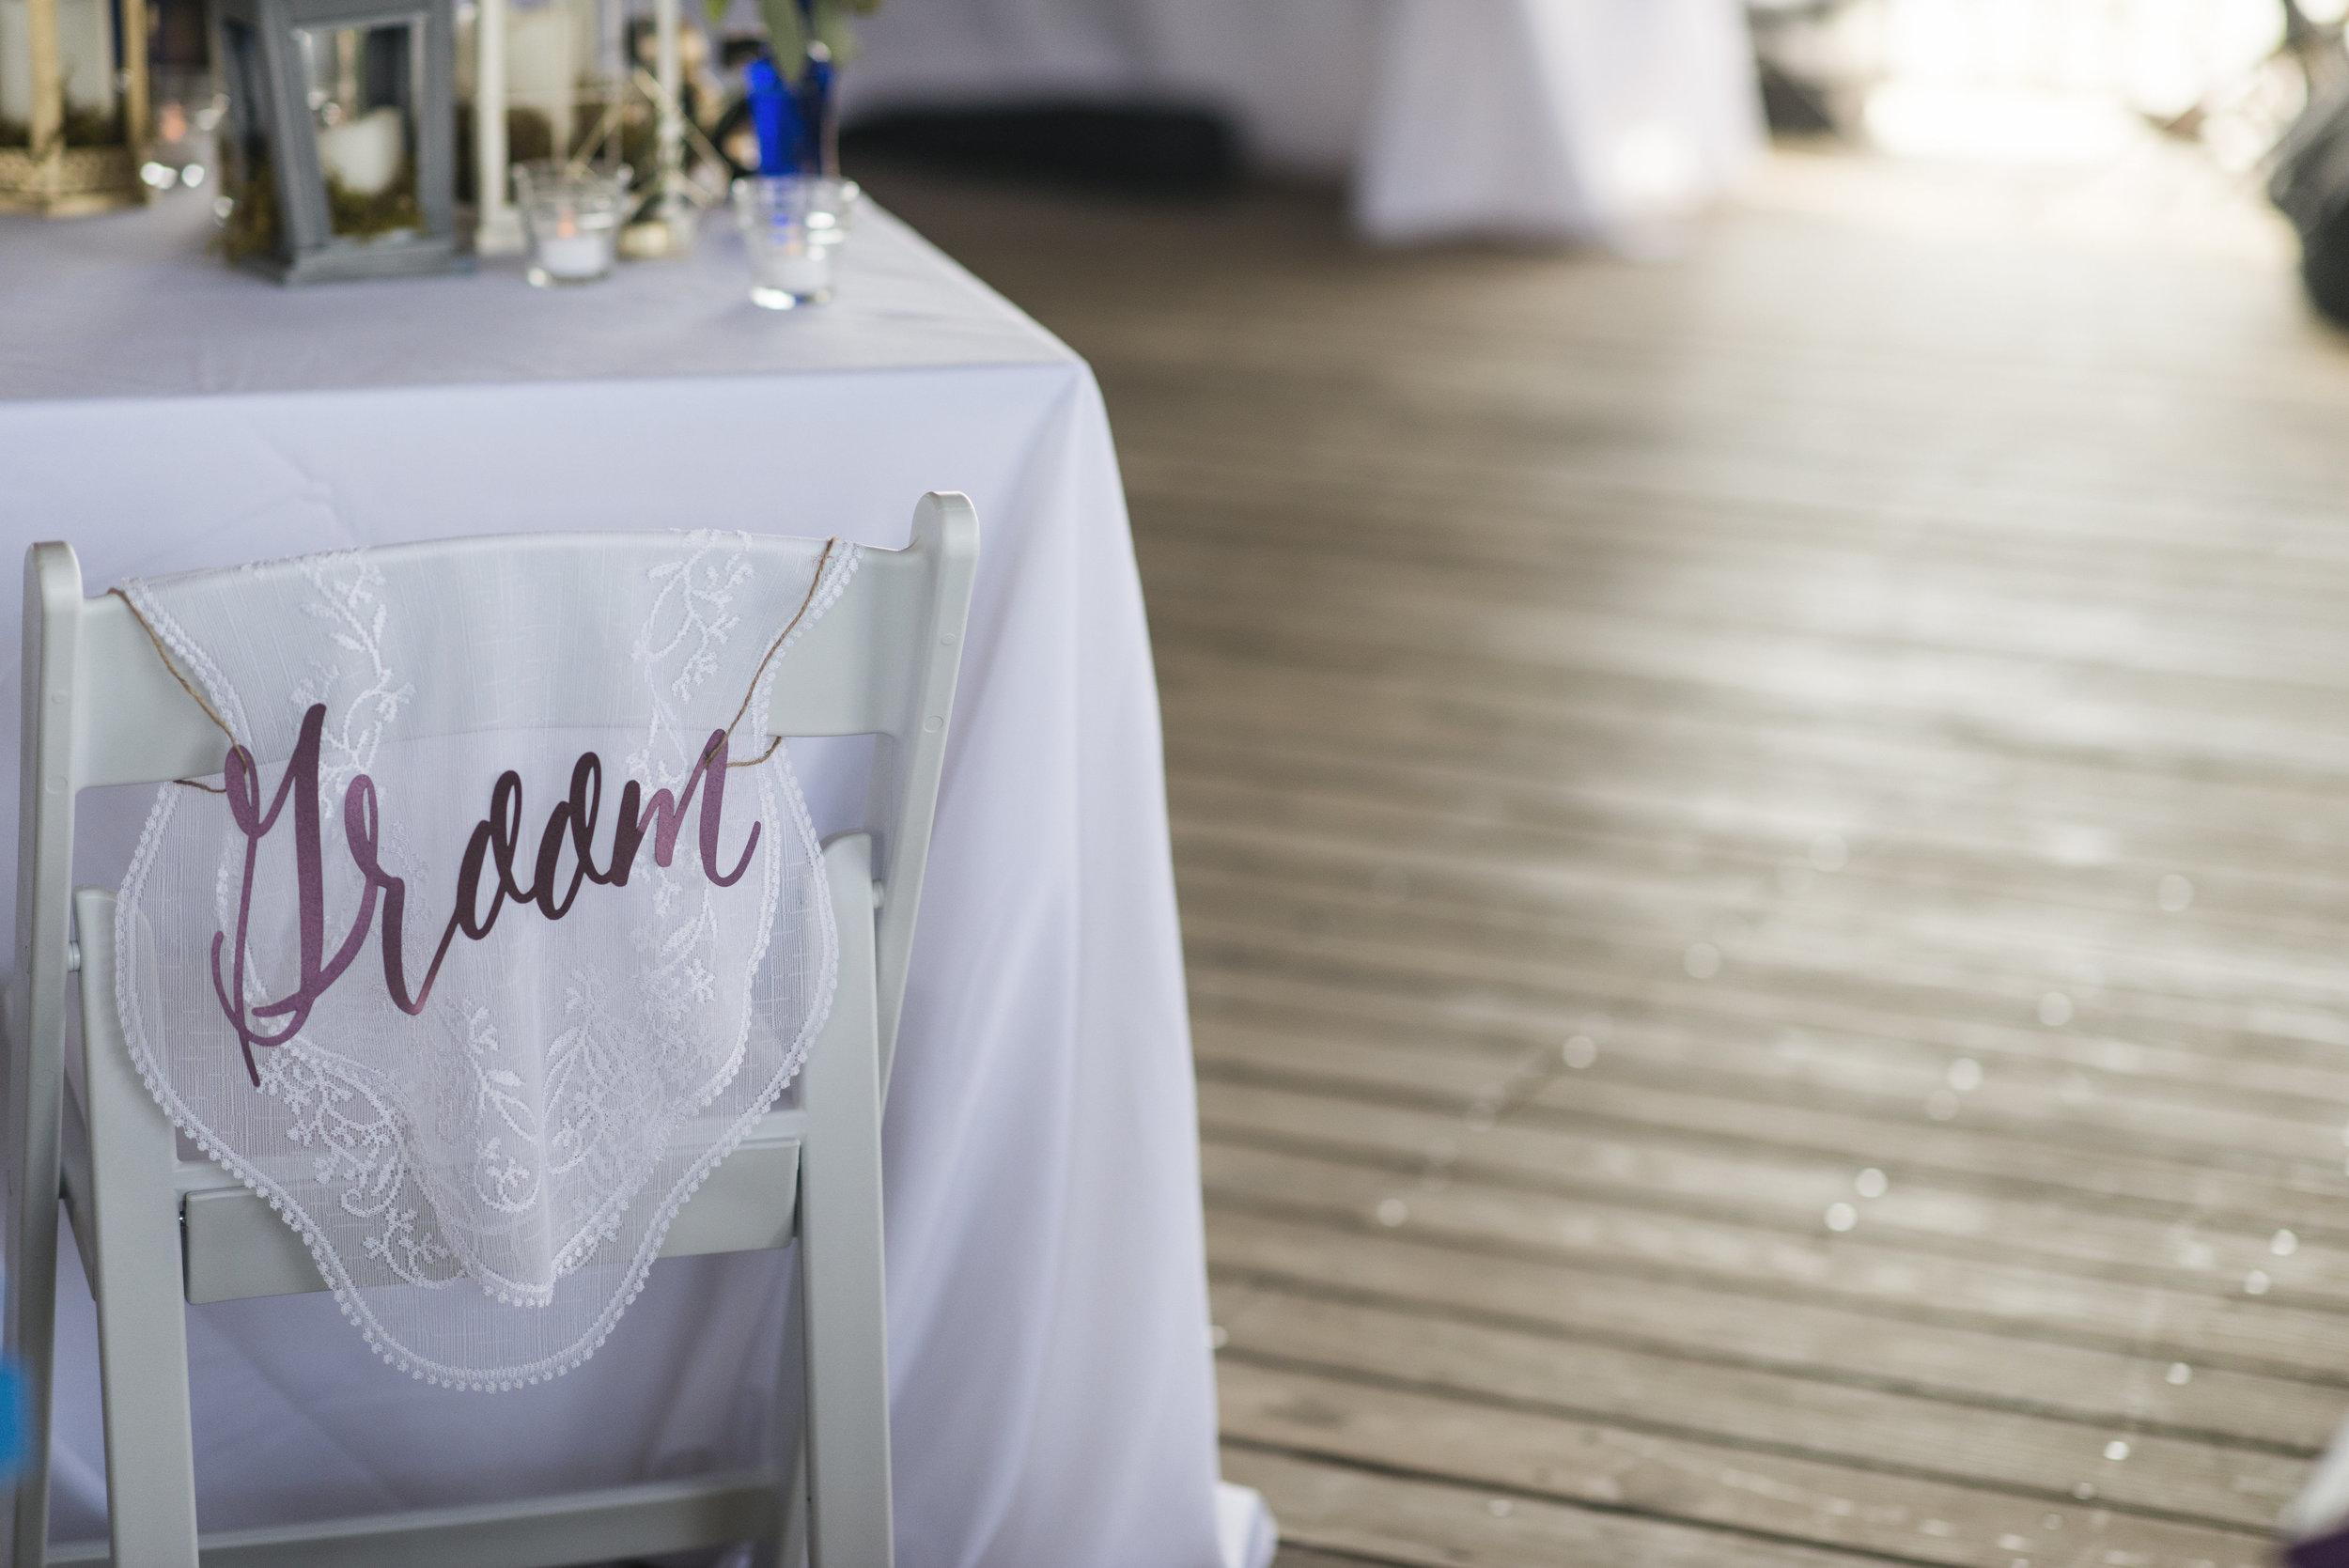 Bohemian Beach Wedding - Wedding Chair Details - Grace and Serendipity + Aislinn Kate Photography